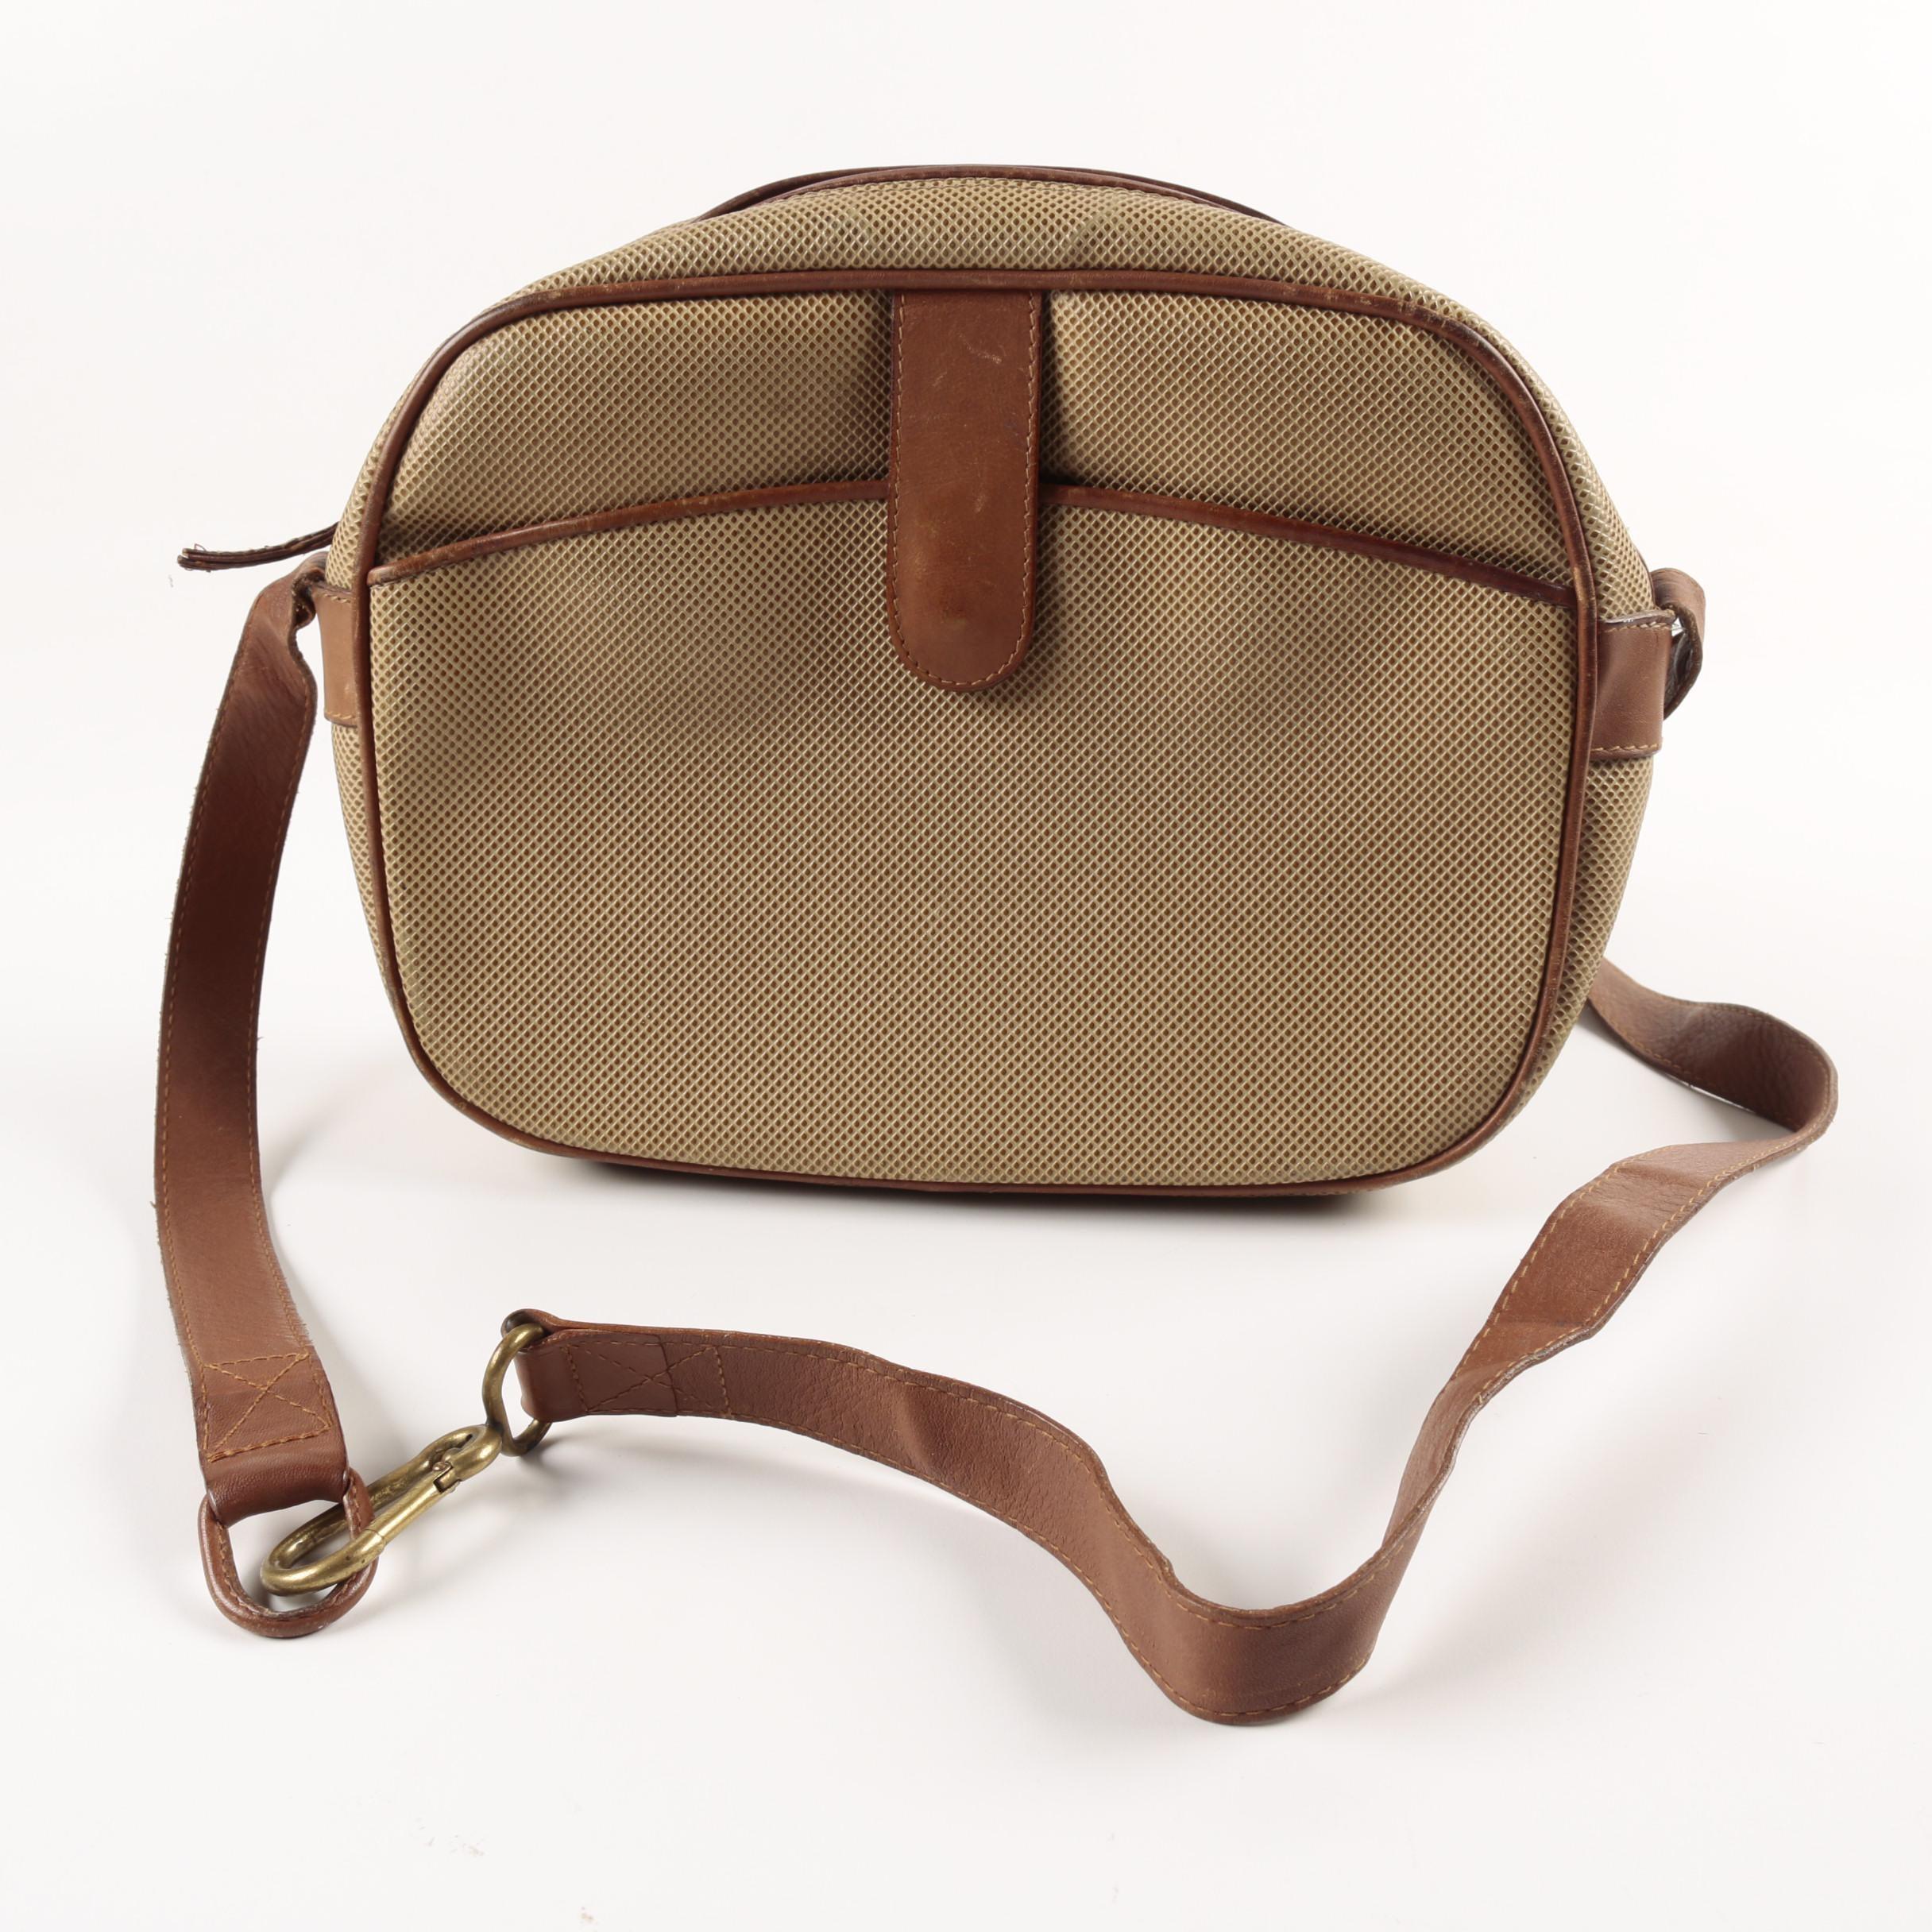 Bottega Veneta Tan Textured Leather Handbag